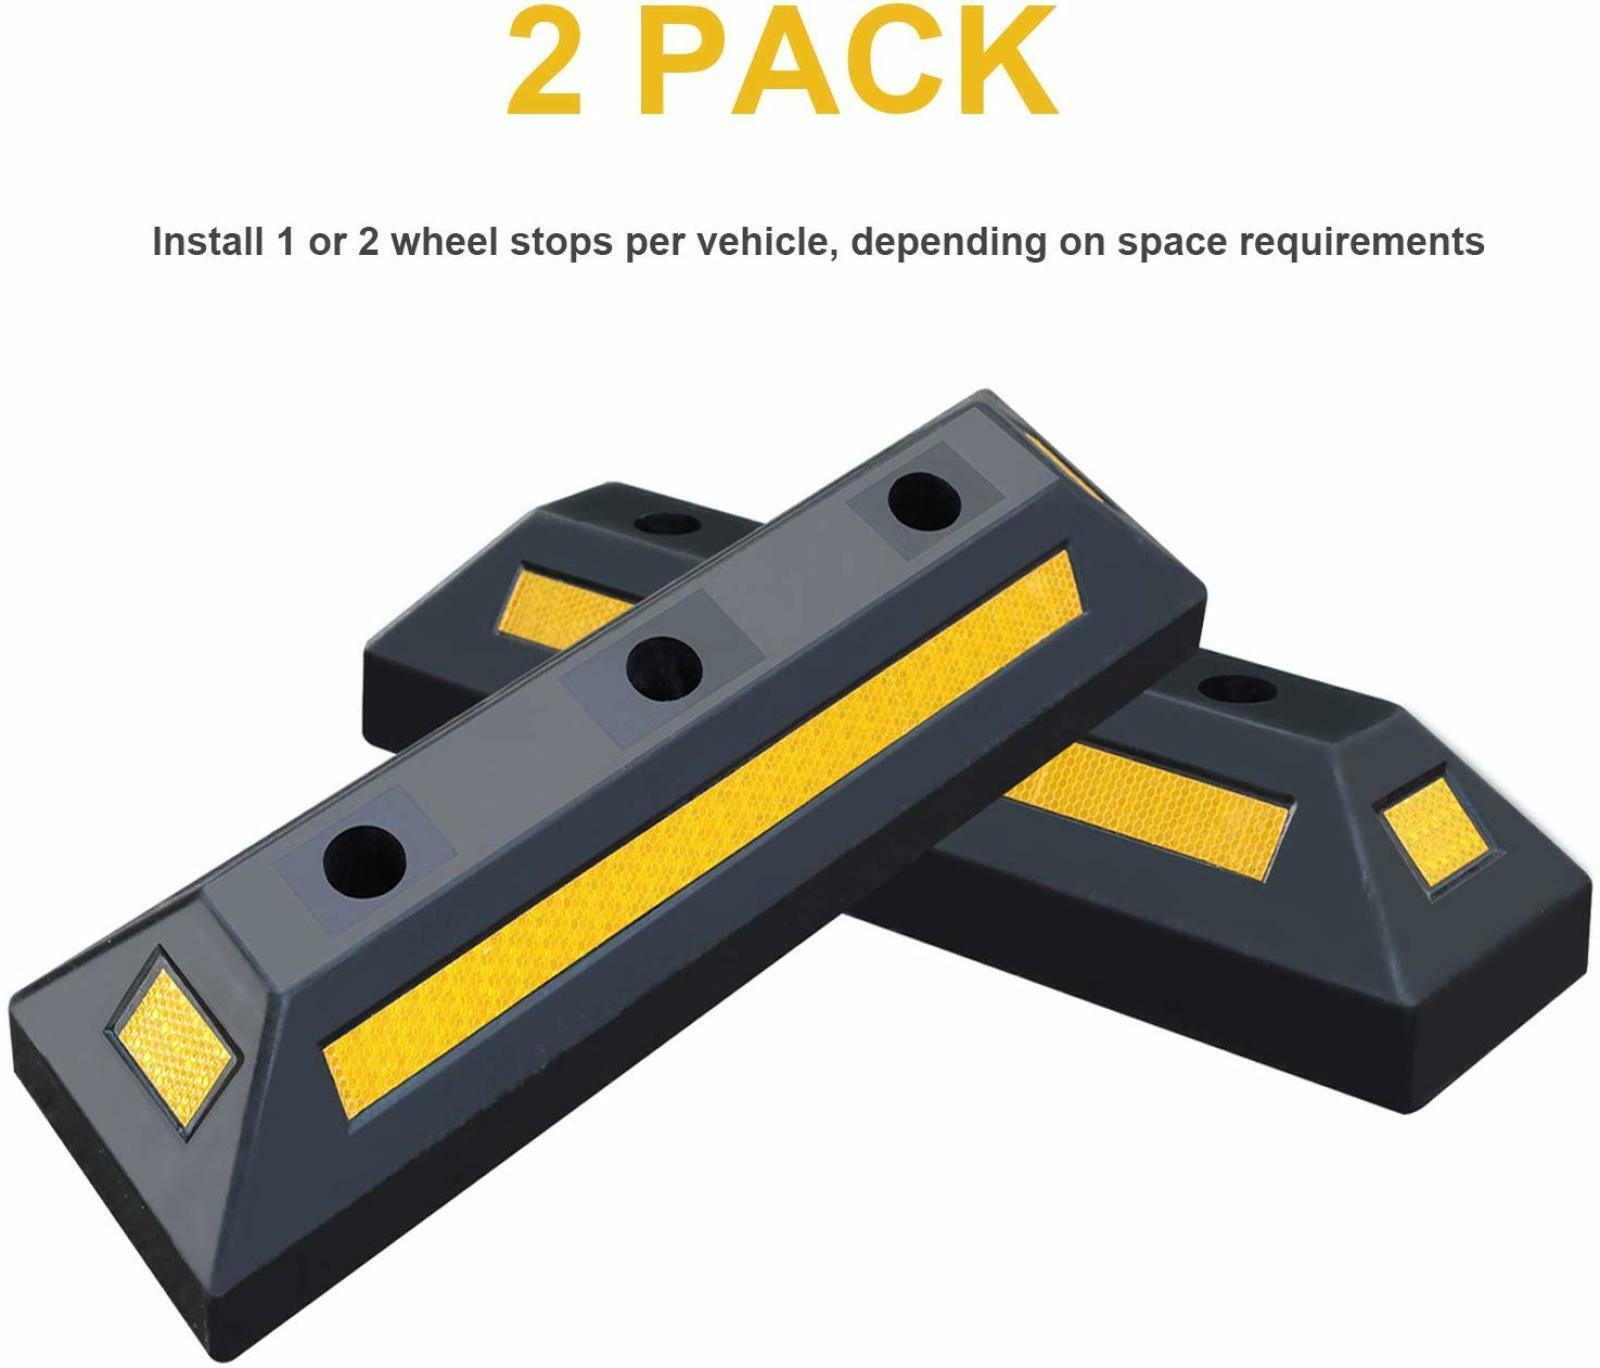 Heavy Duty Rubber Parking Blocks Chocks Wheel Stop for Car Truck RV Trailer 2pk